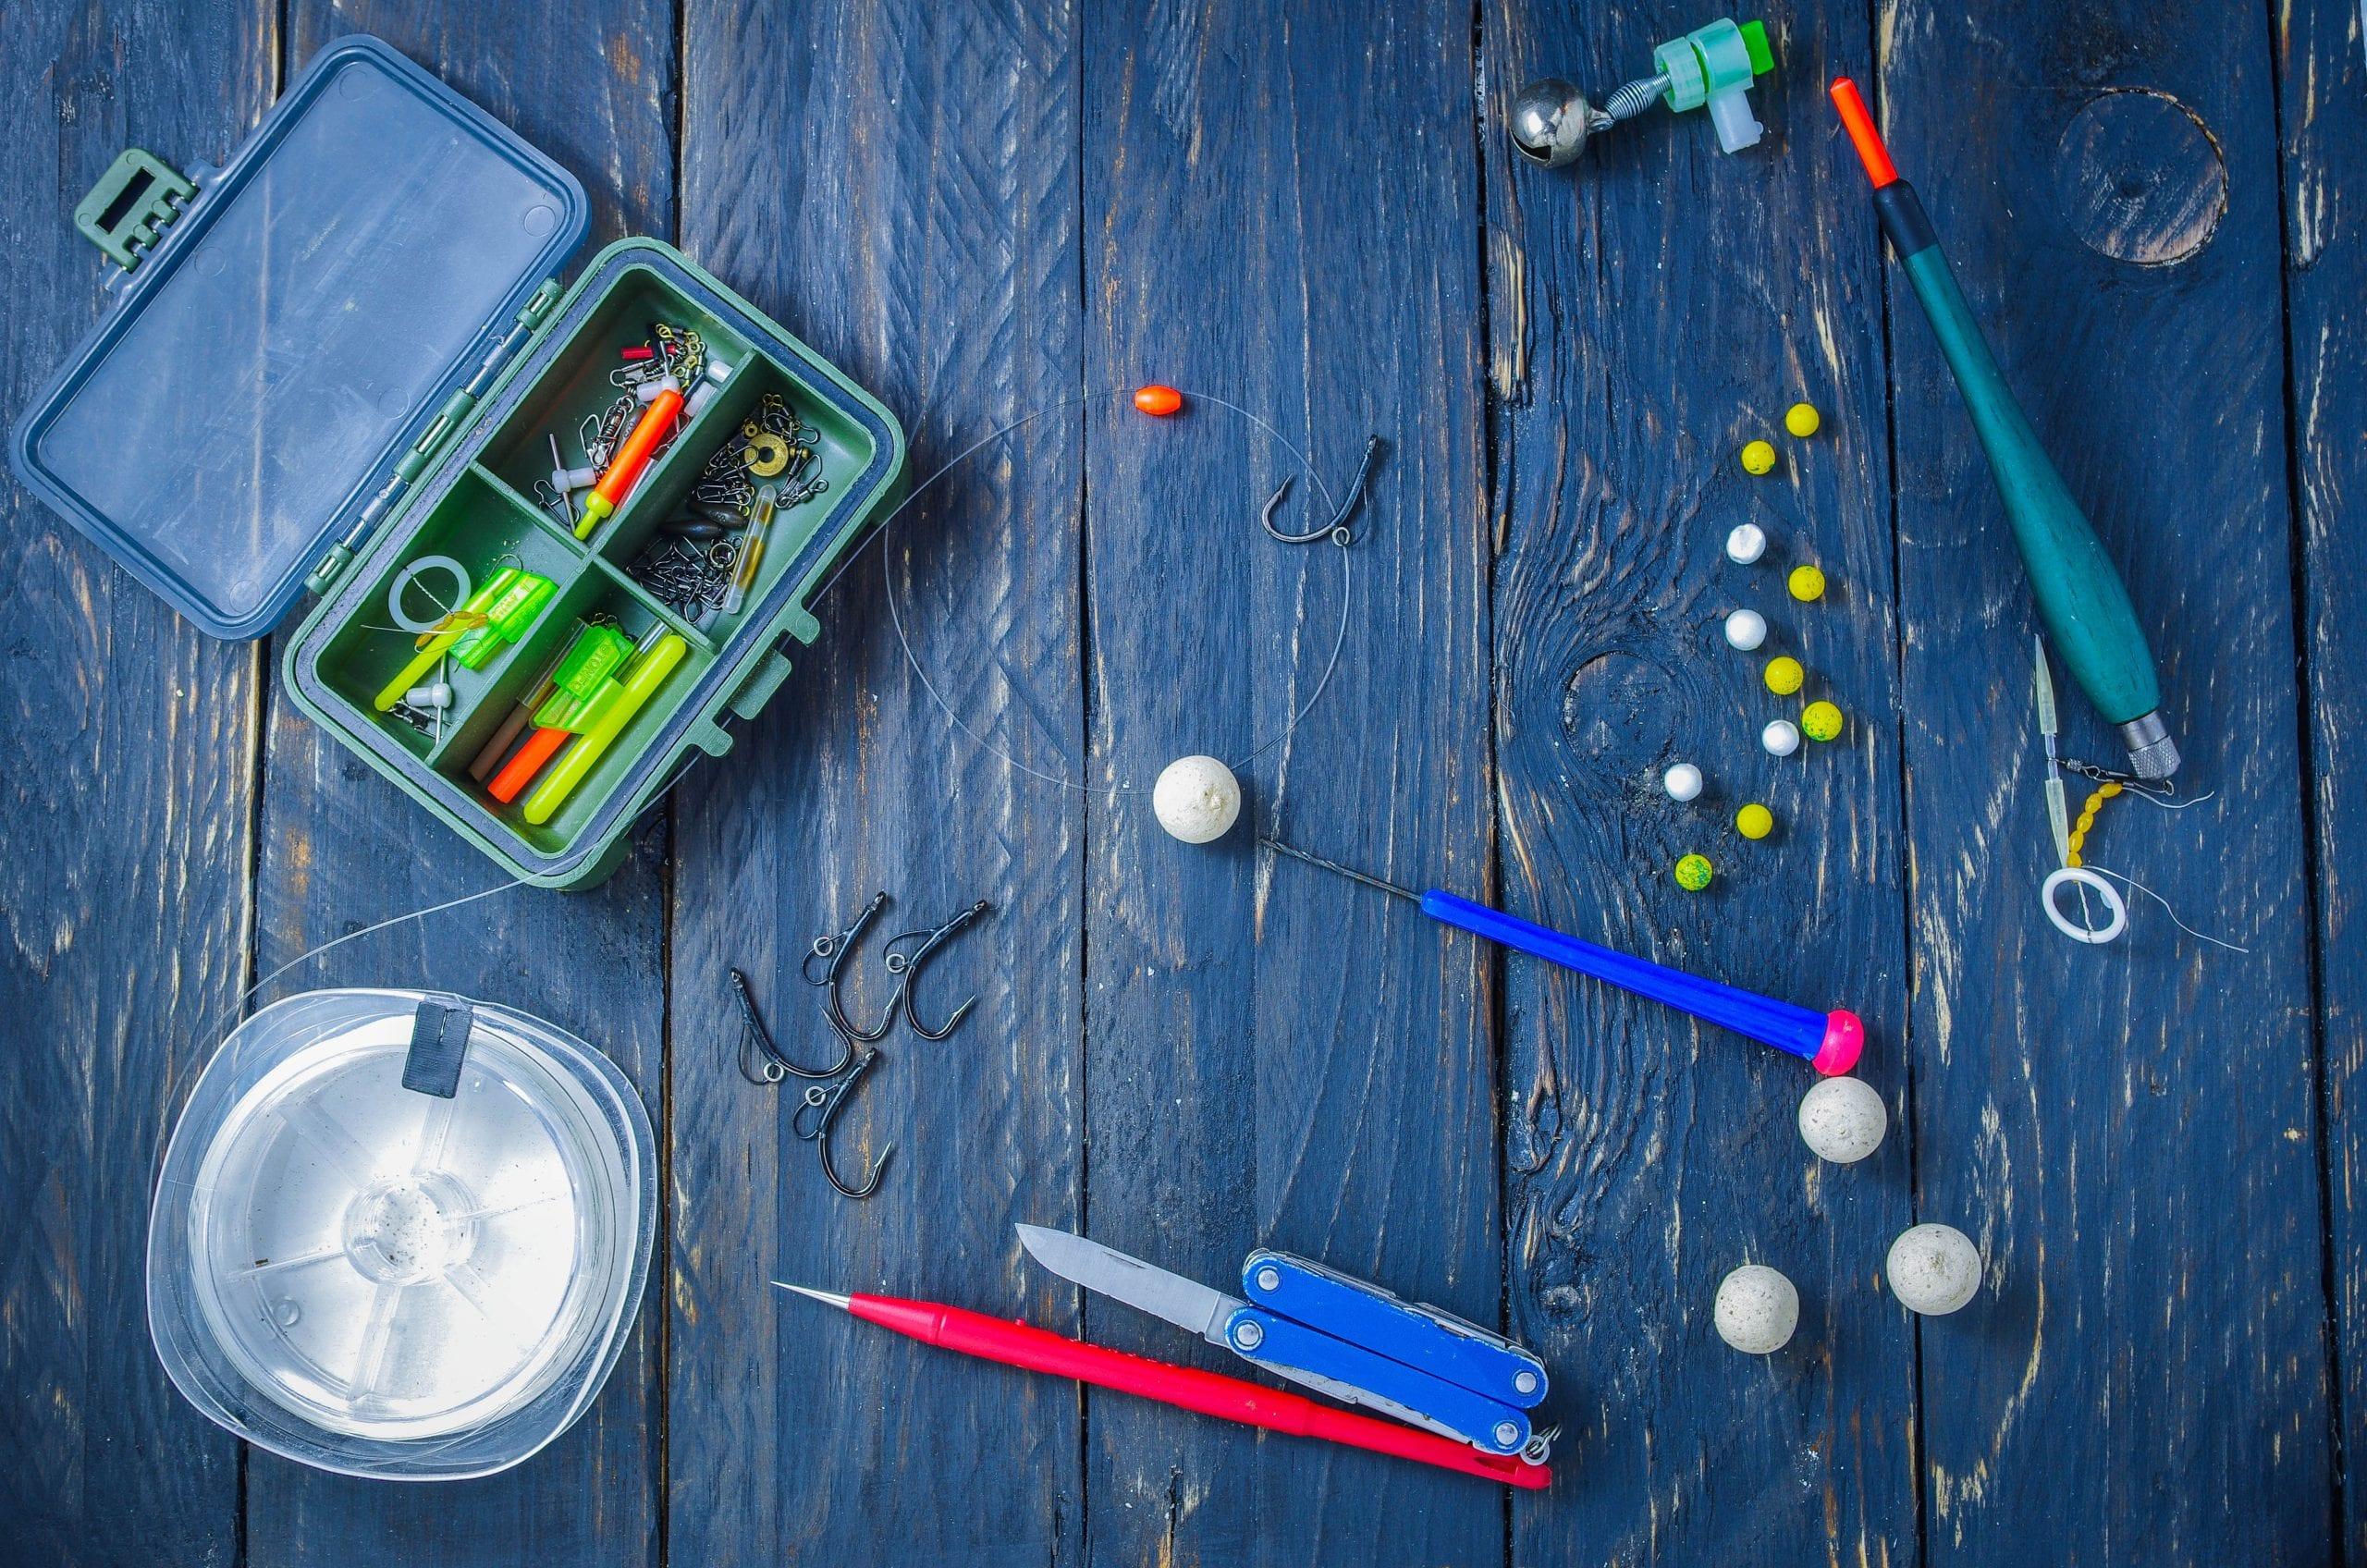 Accessory Accessories For Carp Fishing. Sport Fishing. Carp Fishing.